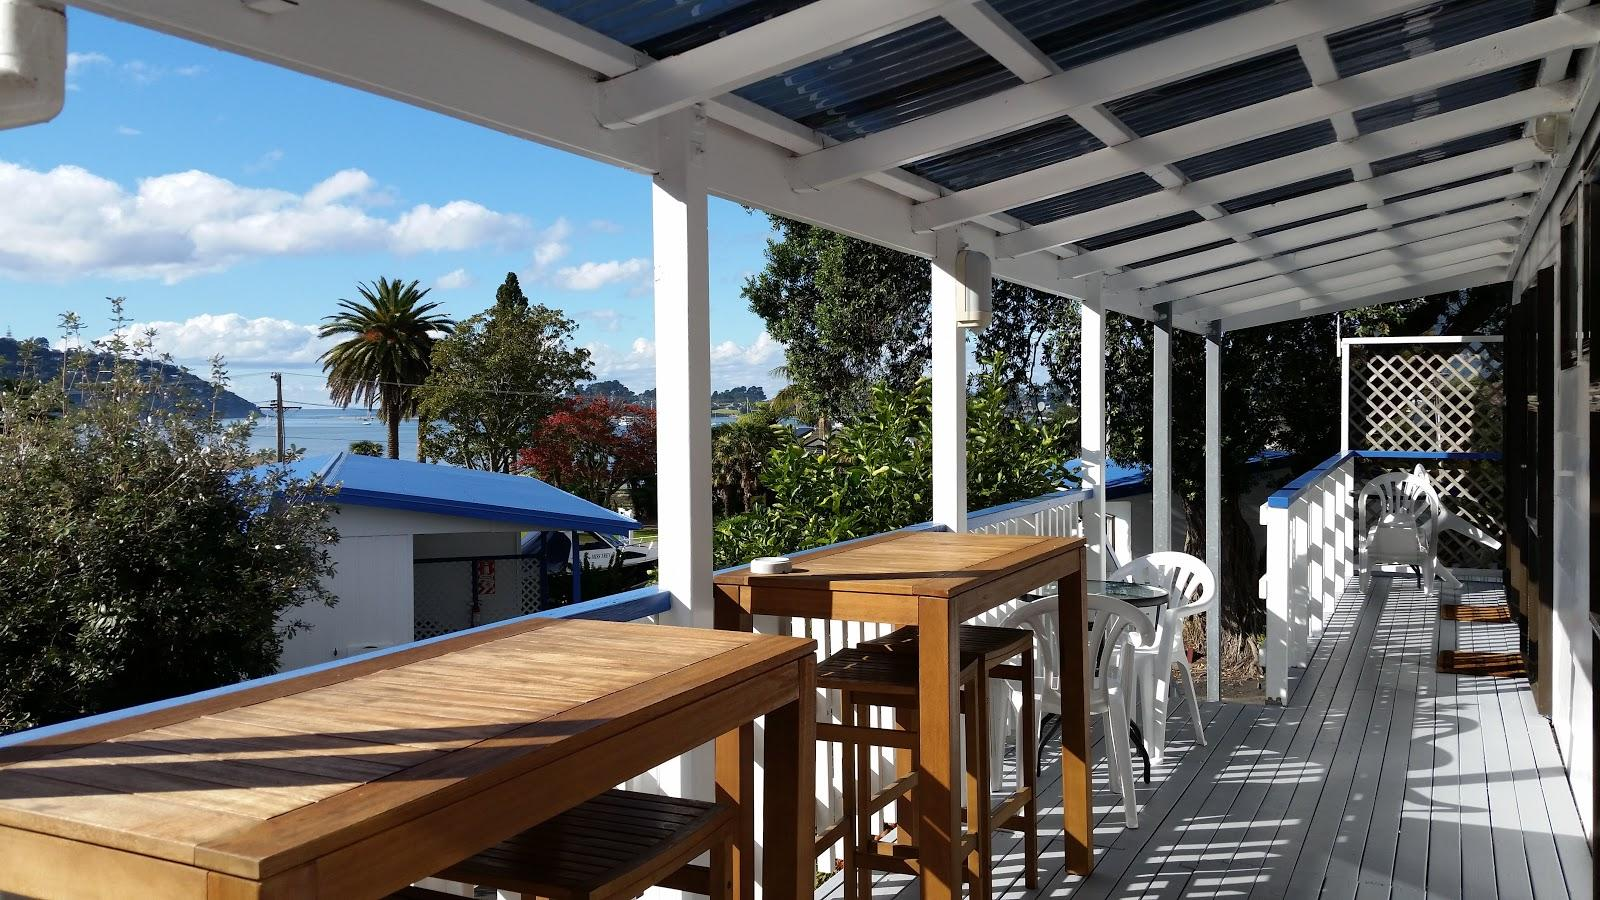 Pauanui Glade Holiday Park